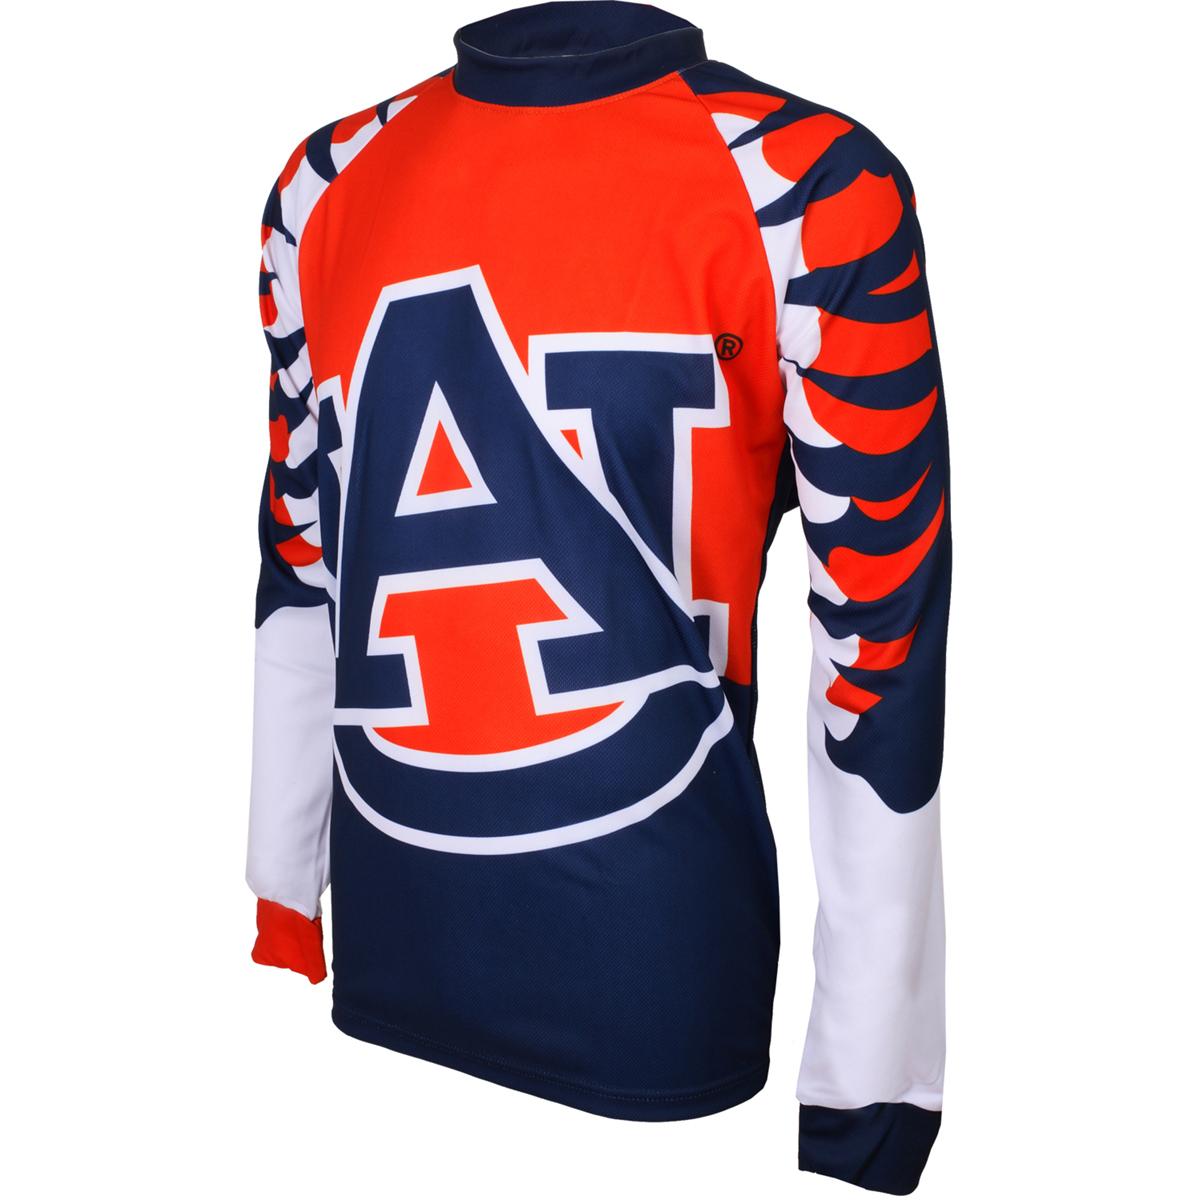 Adrenaline Promotions Auburn University Tigers Long Sleeve Mountain Bike Jersey